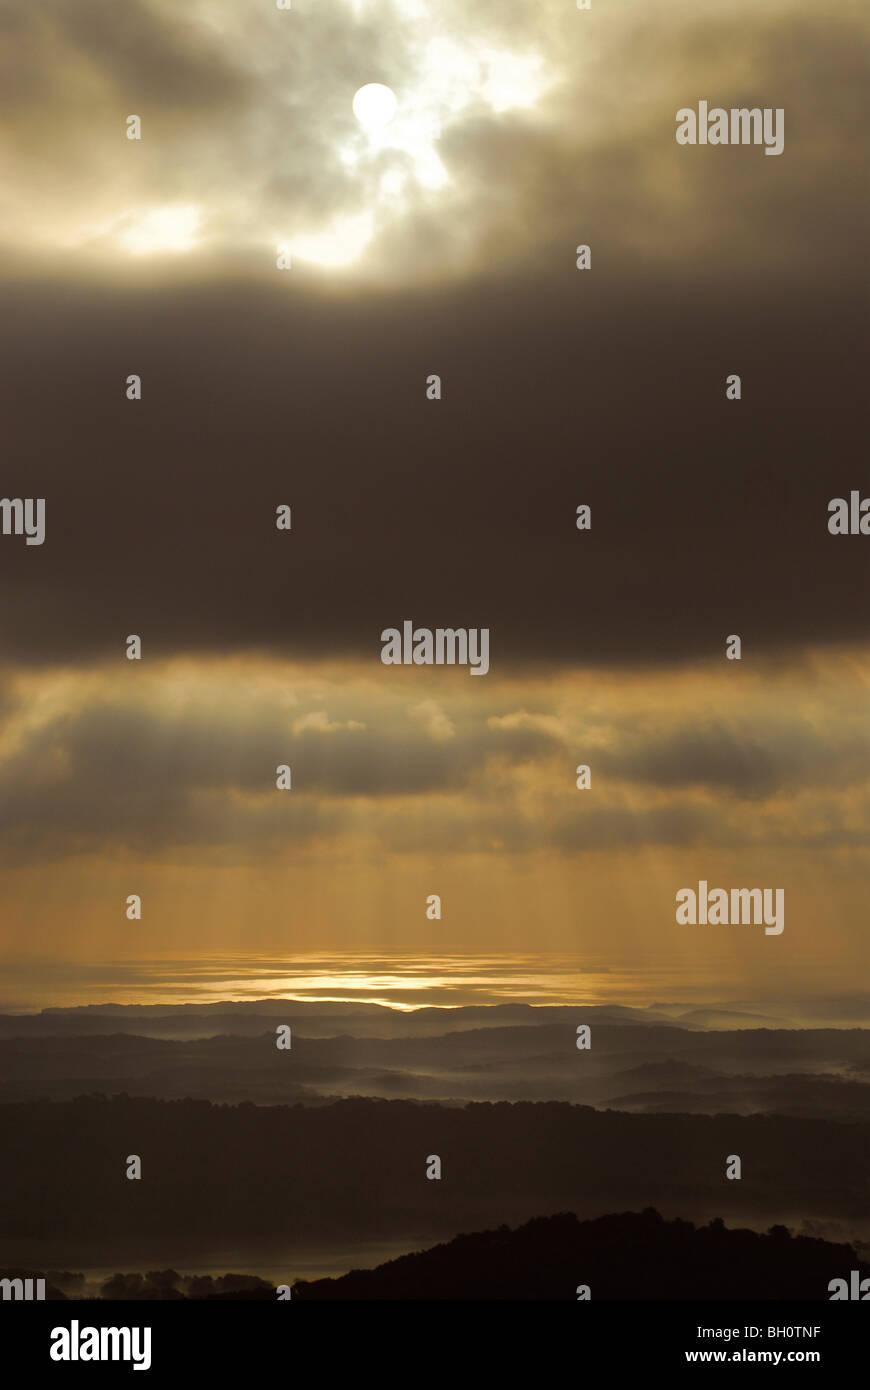 Landscape northeast of Monte Toro at sunrise, Minorca, Balearic Islands, Spain - Stock Image